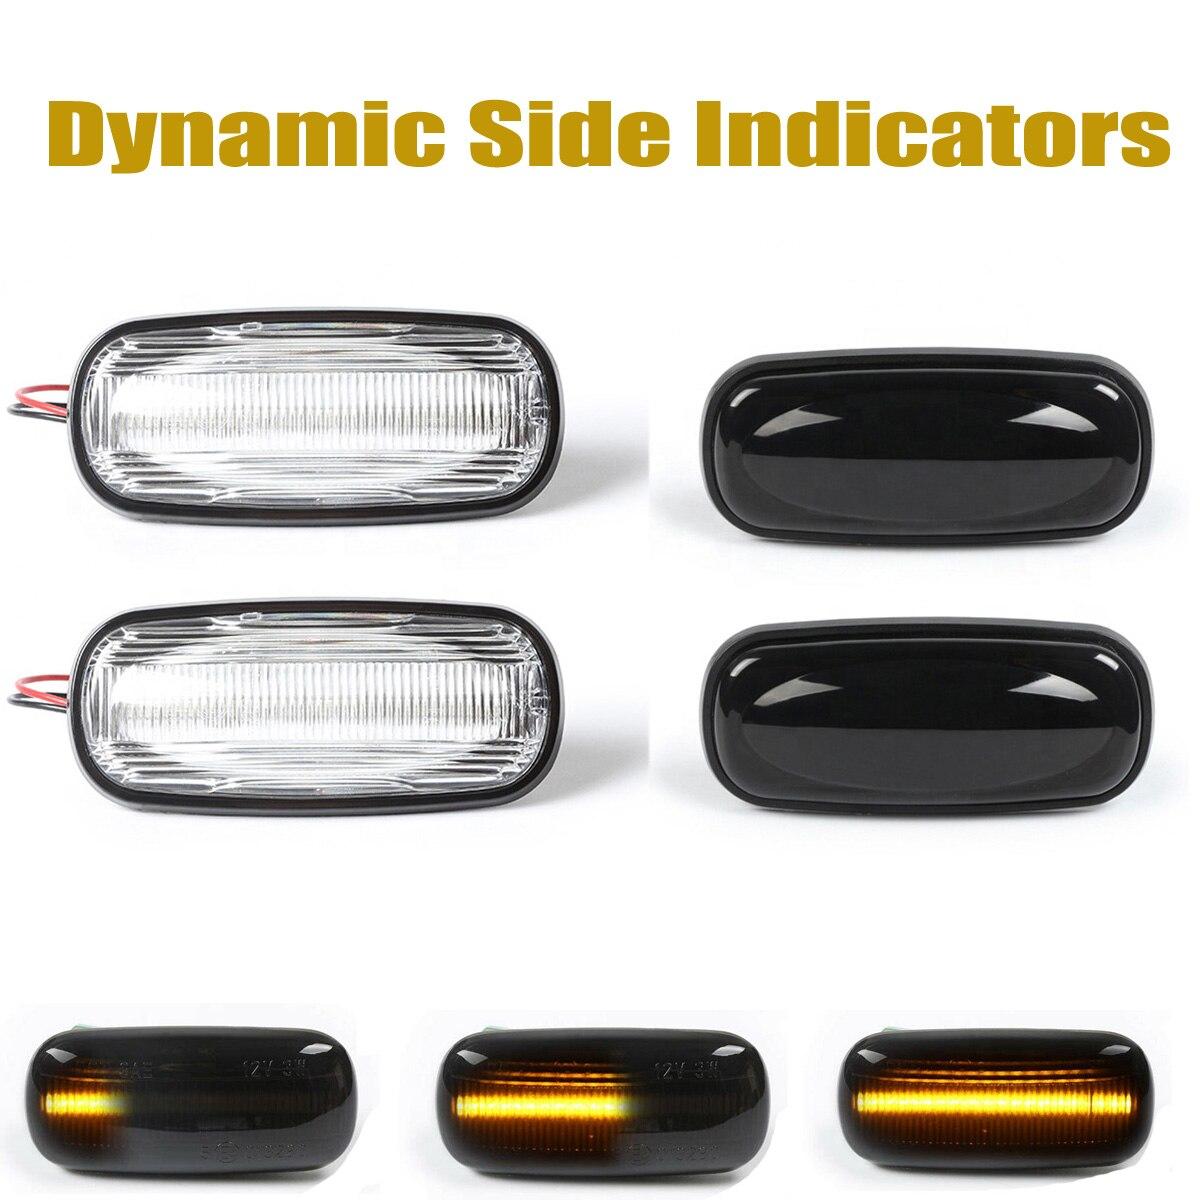 Dynamic Side Marker Indicators for L-and R-over D-iscovery 2 1999-2004 Defender Freelander 1 2002-2005